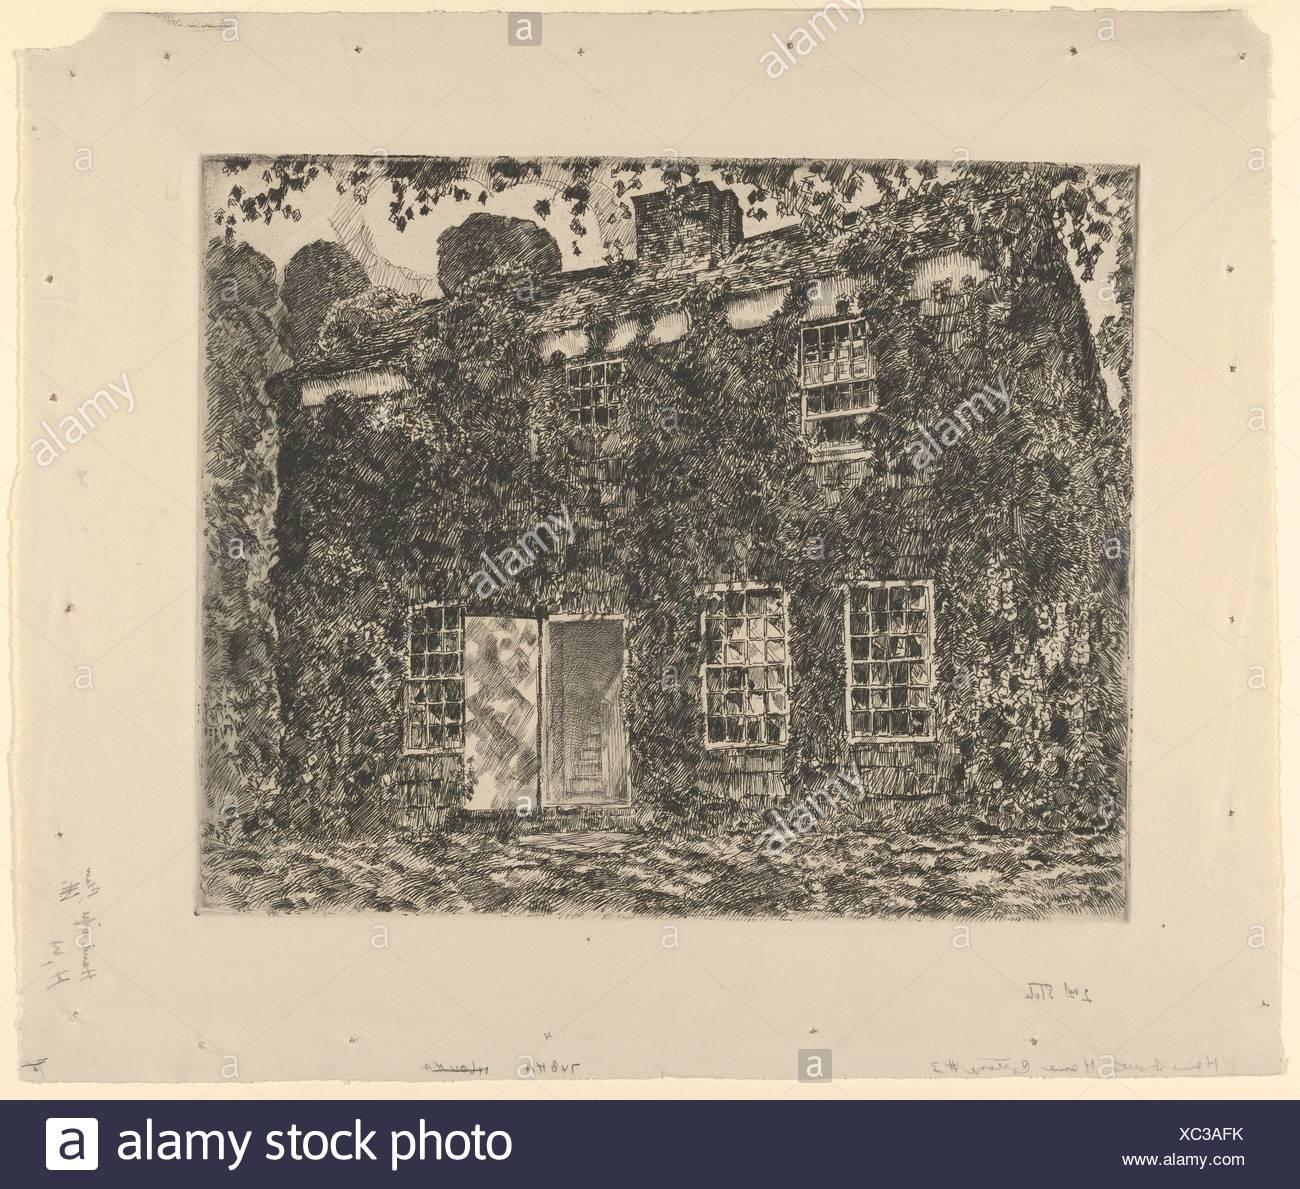 Home Sweet Home Cottage No. 3, Easthampton. Artist: Childe Hassam (American, Dorchester, Massachusetts 1859-1935 East Hampton, New York); Date: 1928; - Stock Image